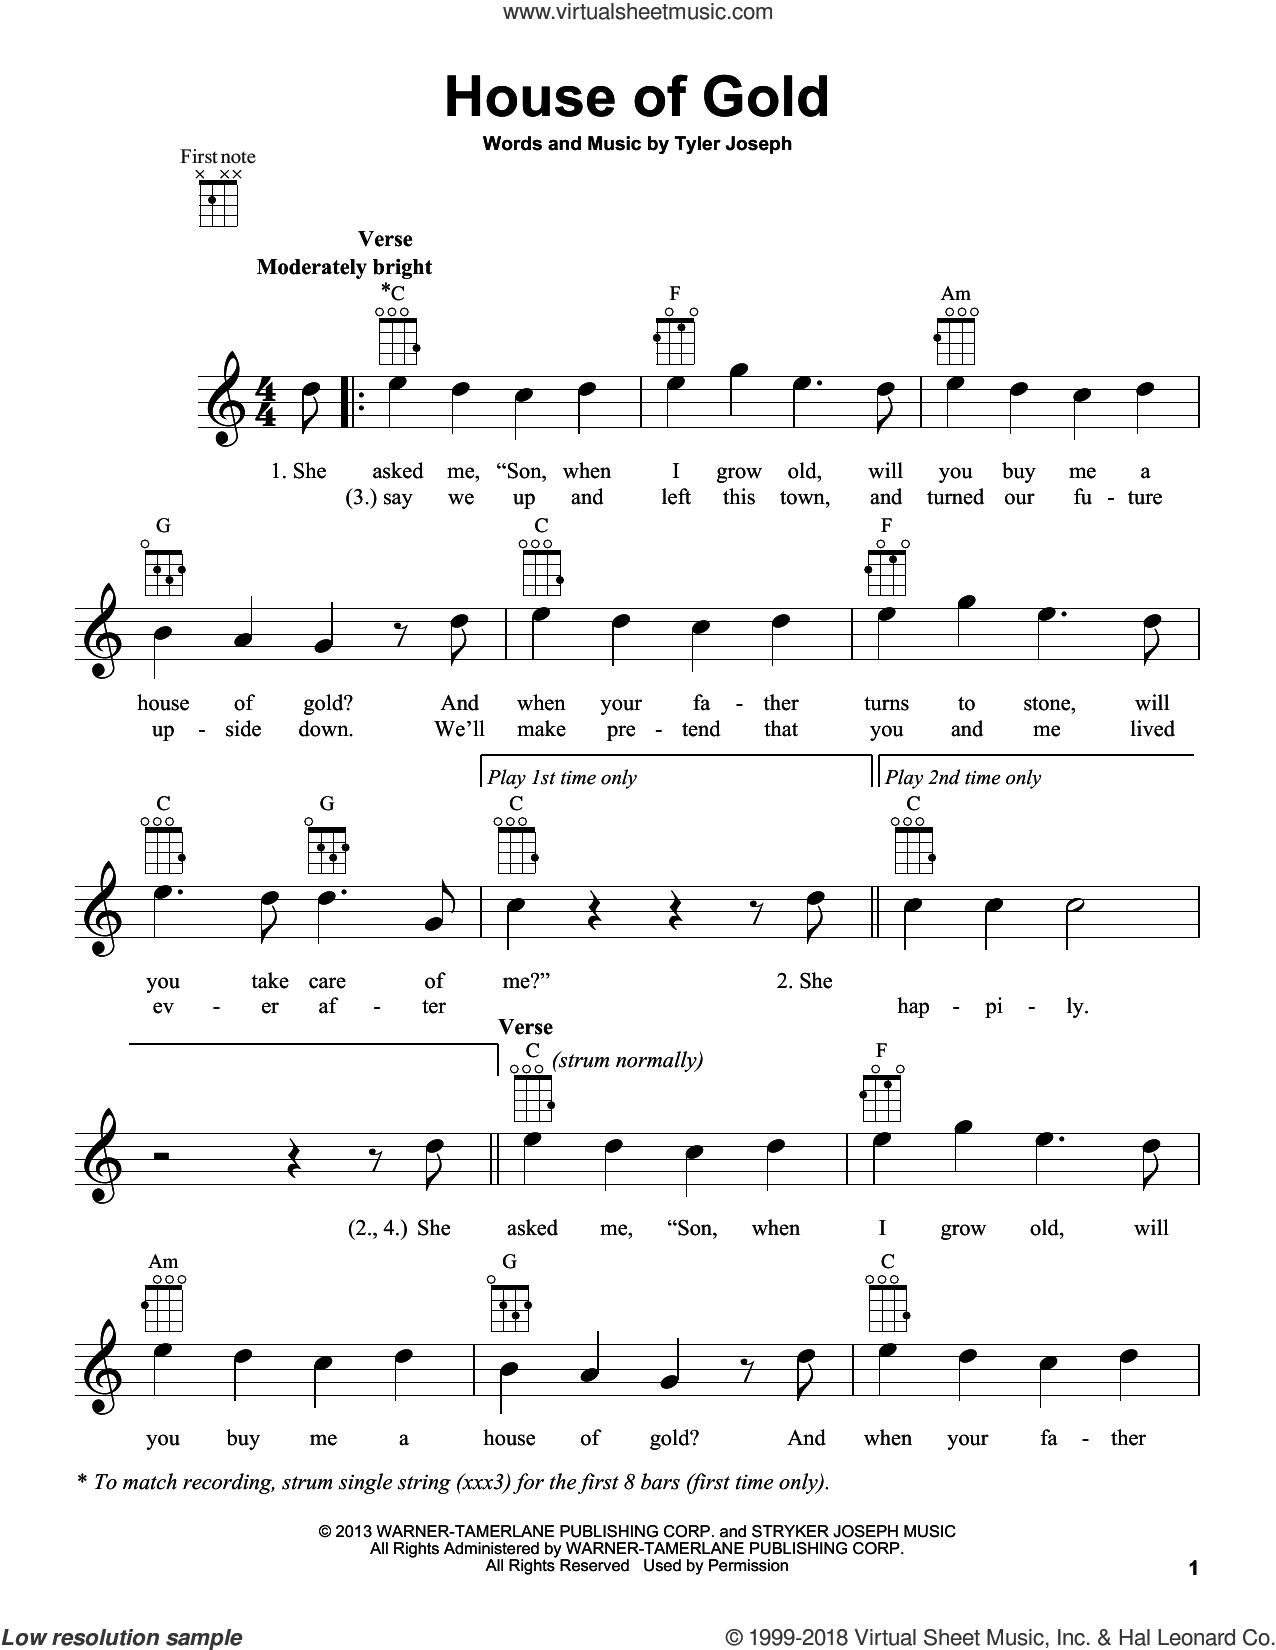 House Of Gold sheet music for ukulele by Twenty One Pilots and Tyler Joseph, intermediate skill level